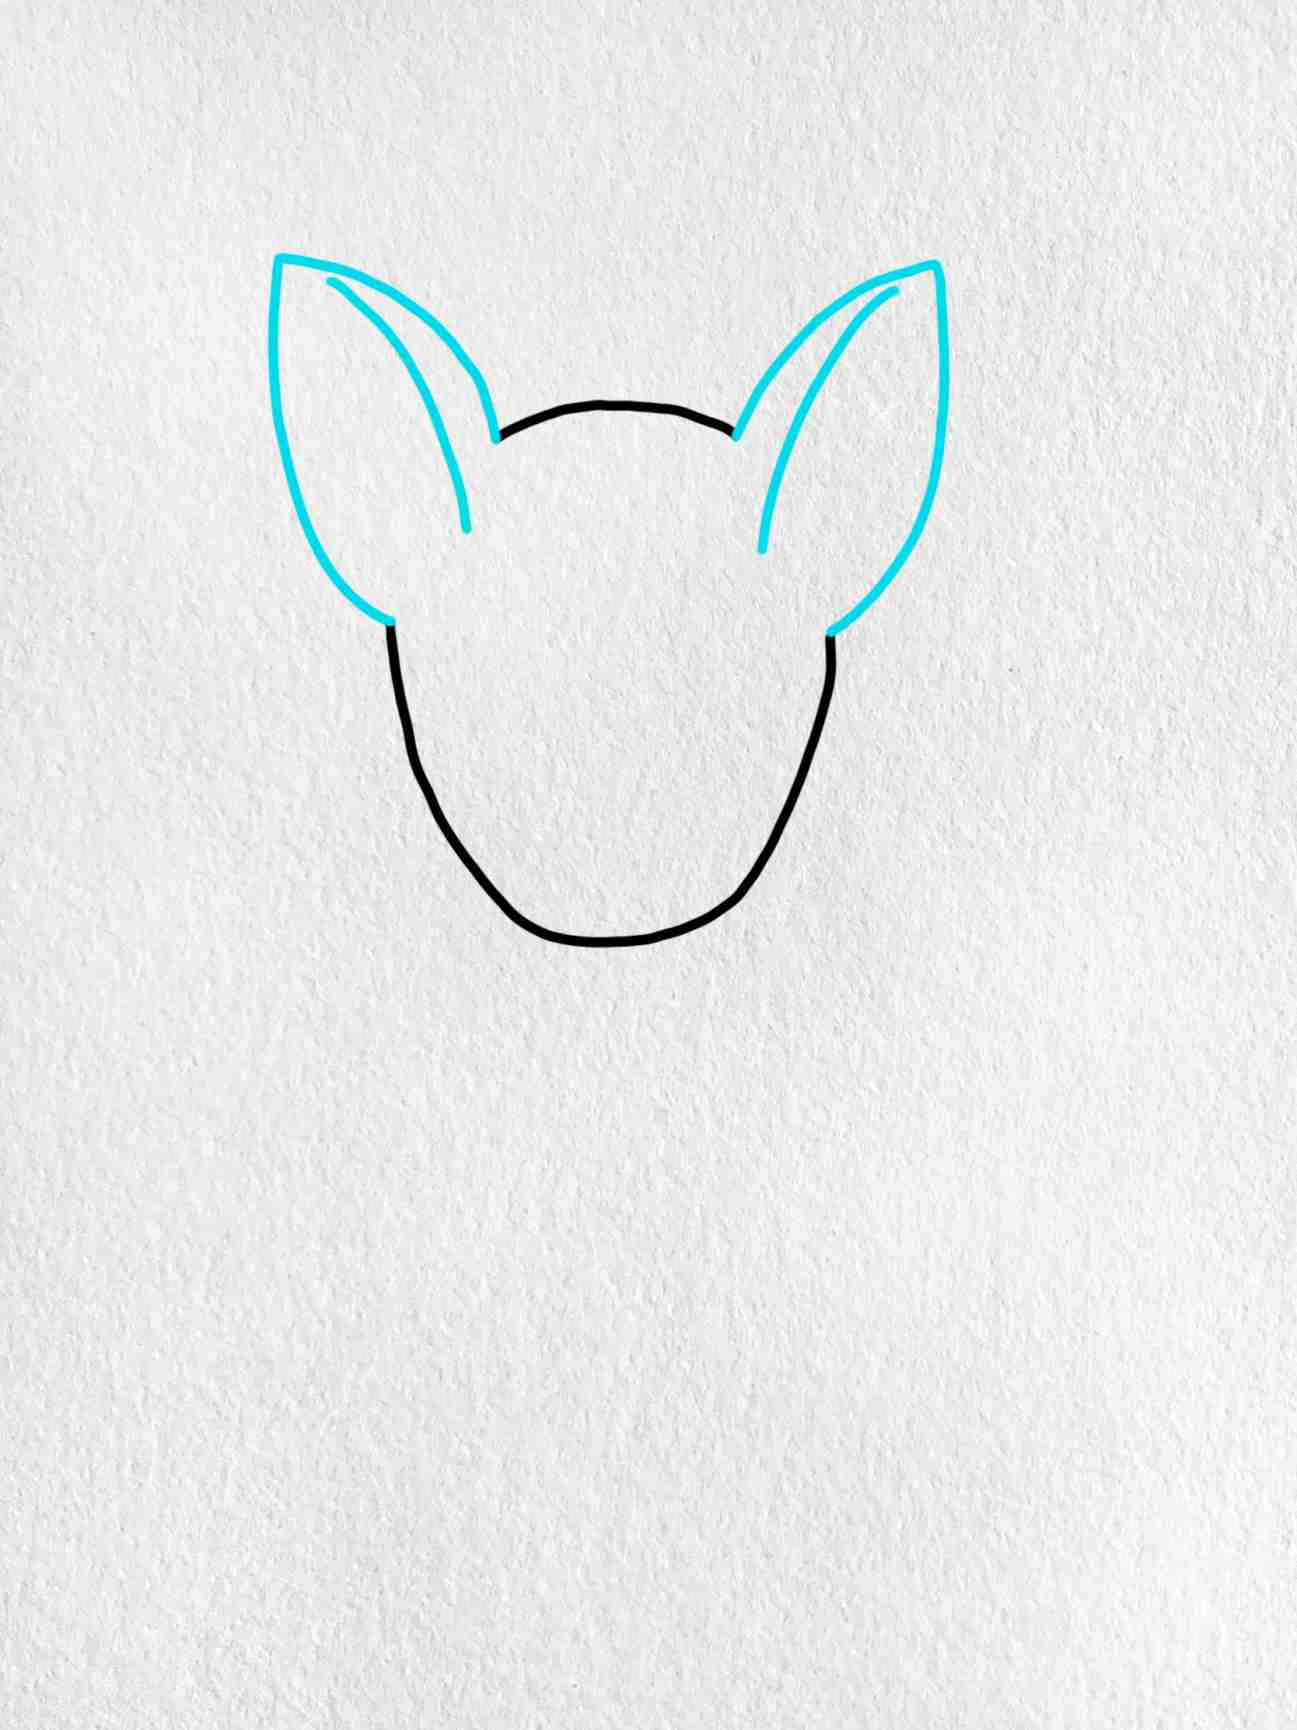 How To Draw A German Shepherd: Step 2